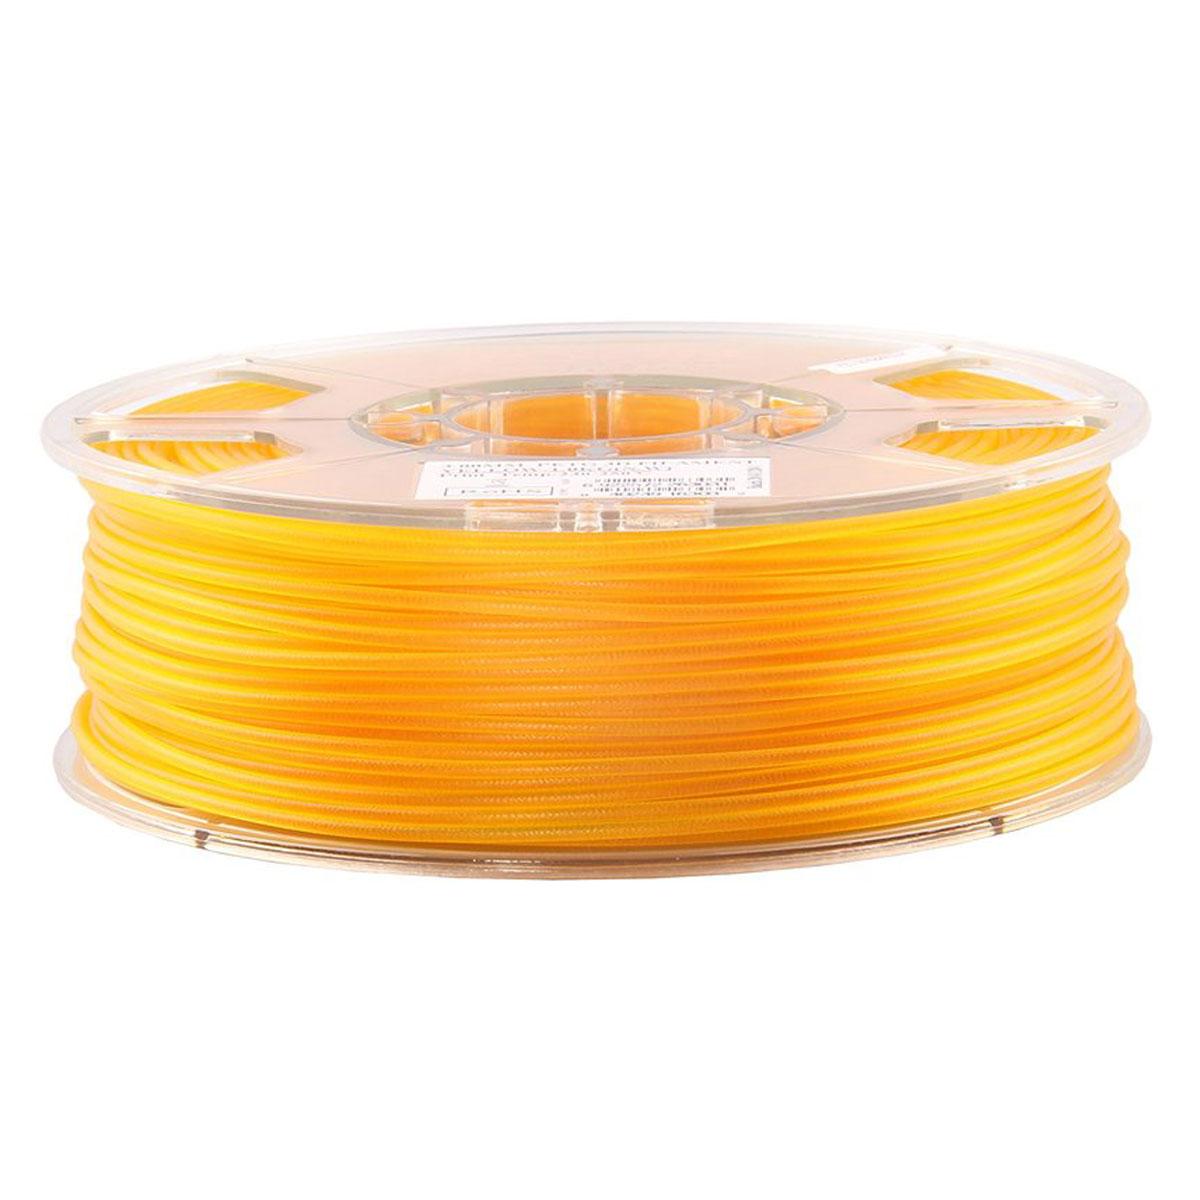 ESUN пластик PLA в катушке, Yellow, 1,75 мм - Расходные материалы